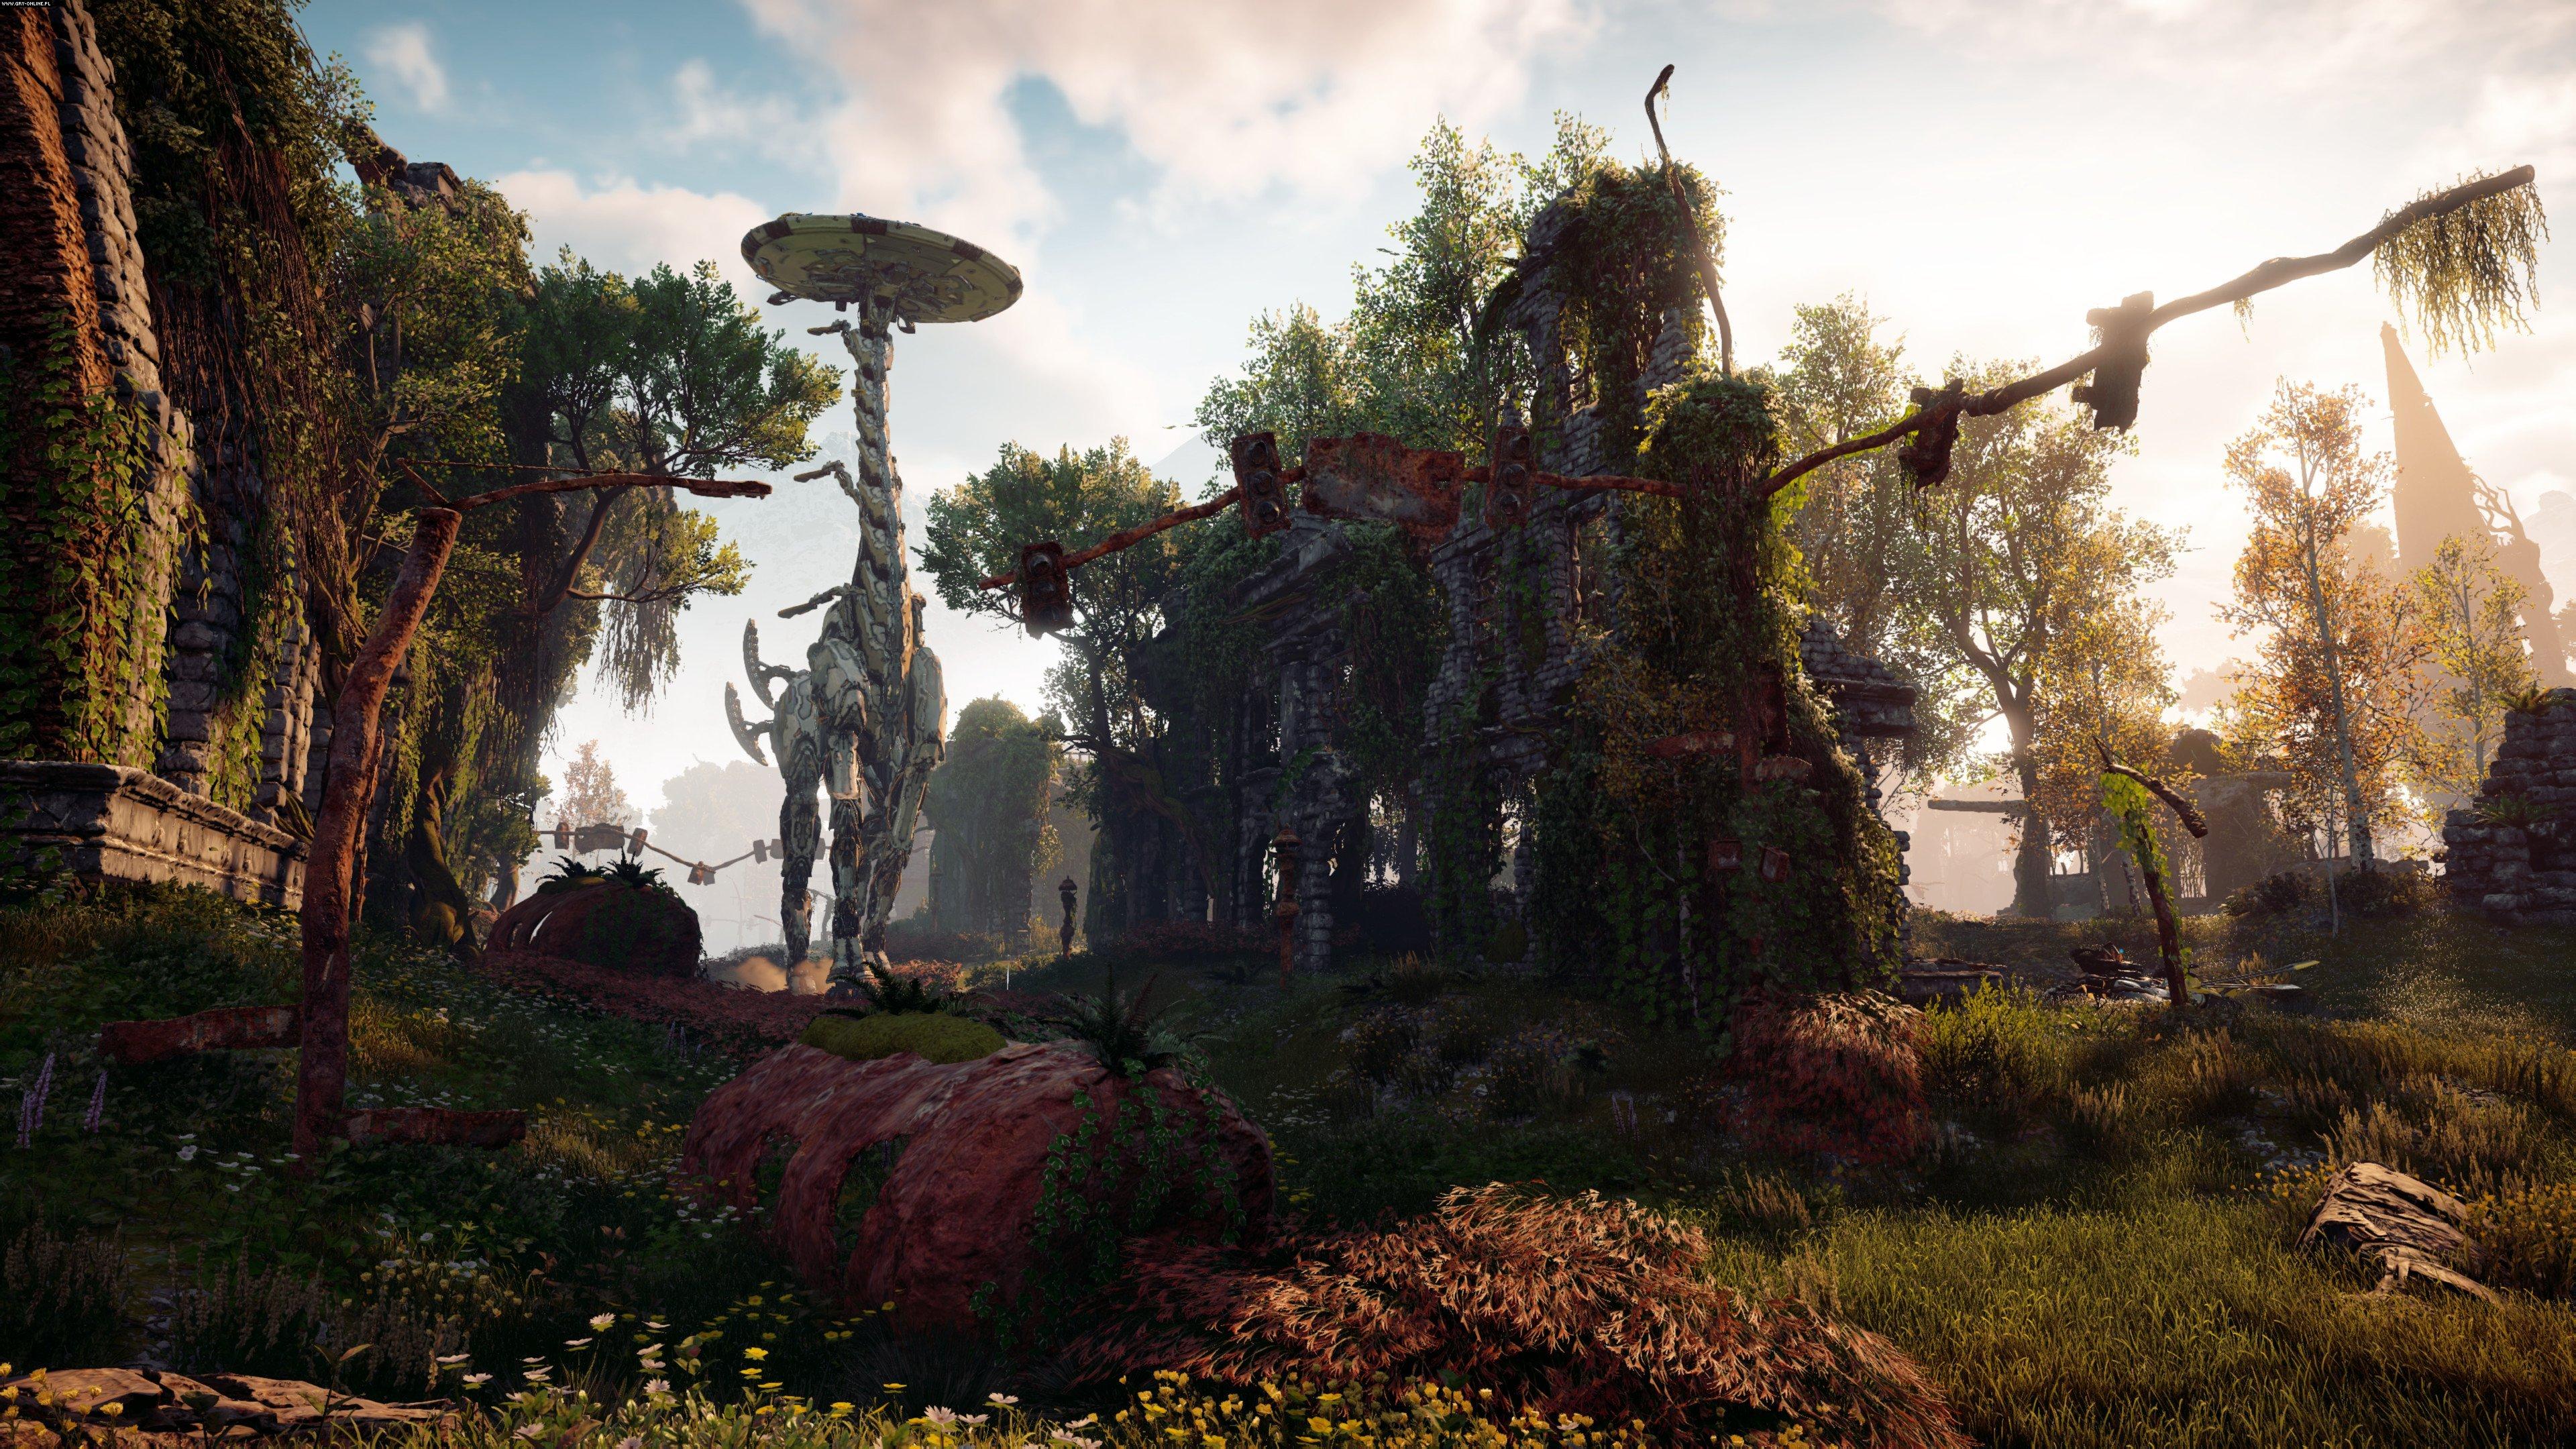 Horizon Zero Dawn PS4 Games Image 2/54, Guerrilla Games, Sony Interactive Entertainment